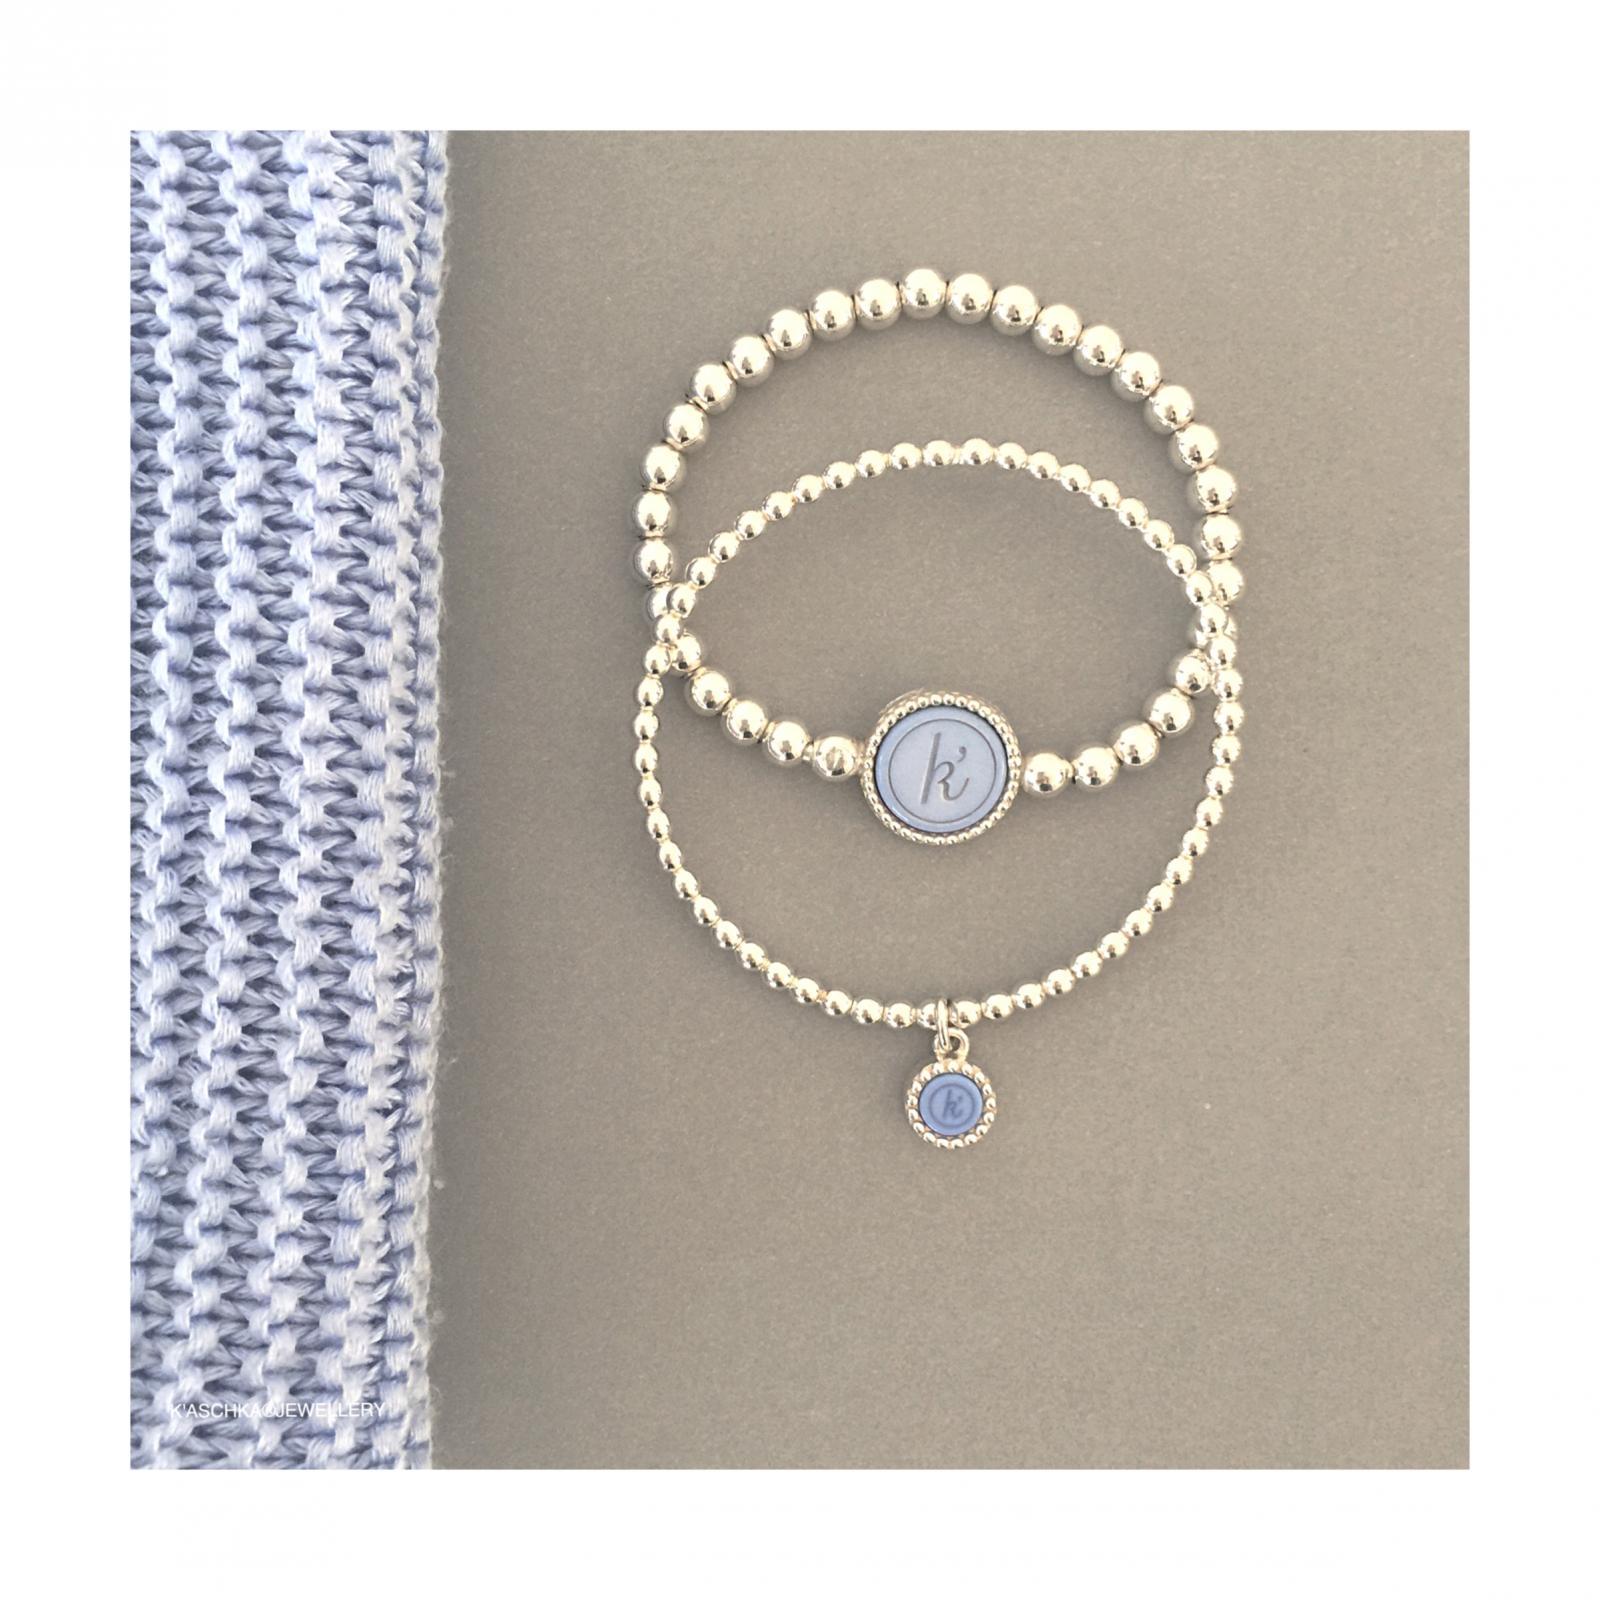 Flexibele 925 sterling zilveren wisselbare armband. Flexibele 925 sterling zilveren armband met kasminis hanger